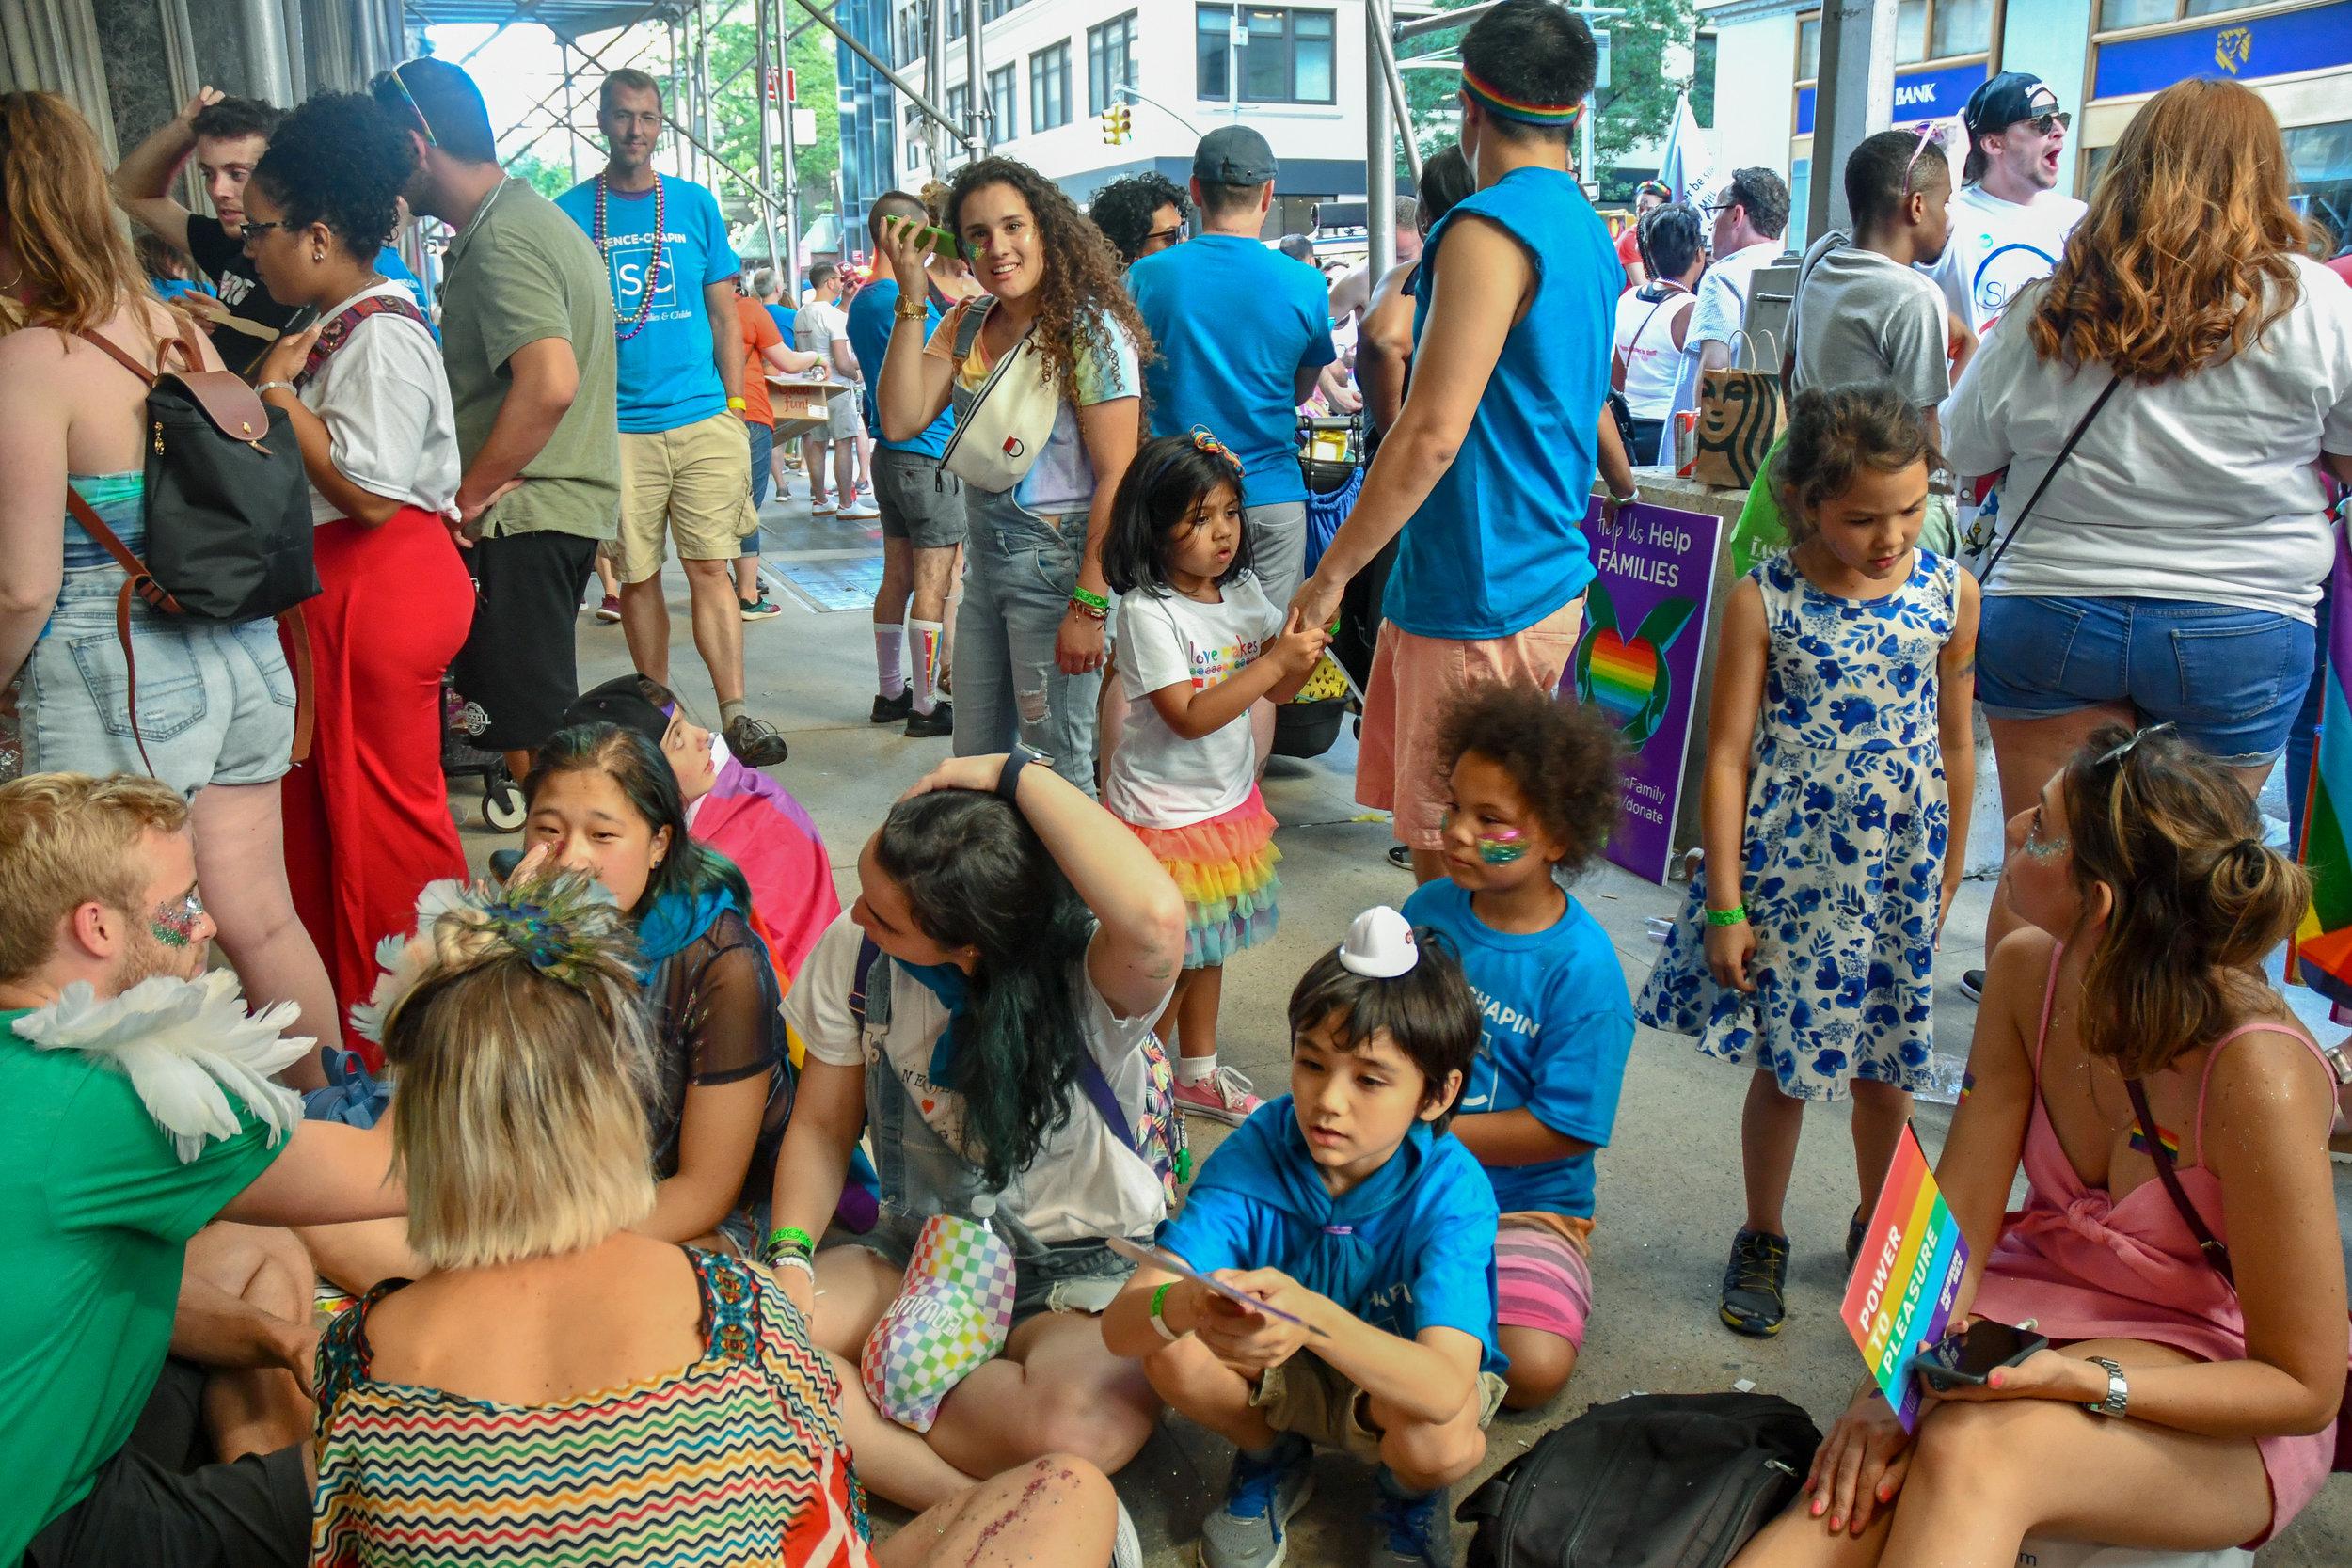 SC-PrideParade-2019_FE-106.jpg